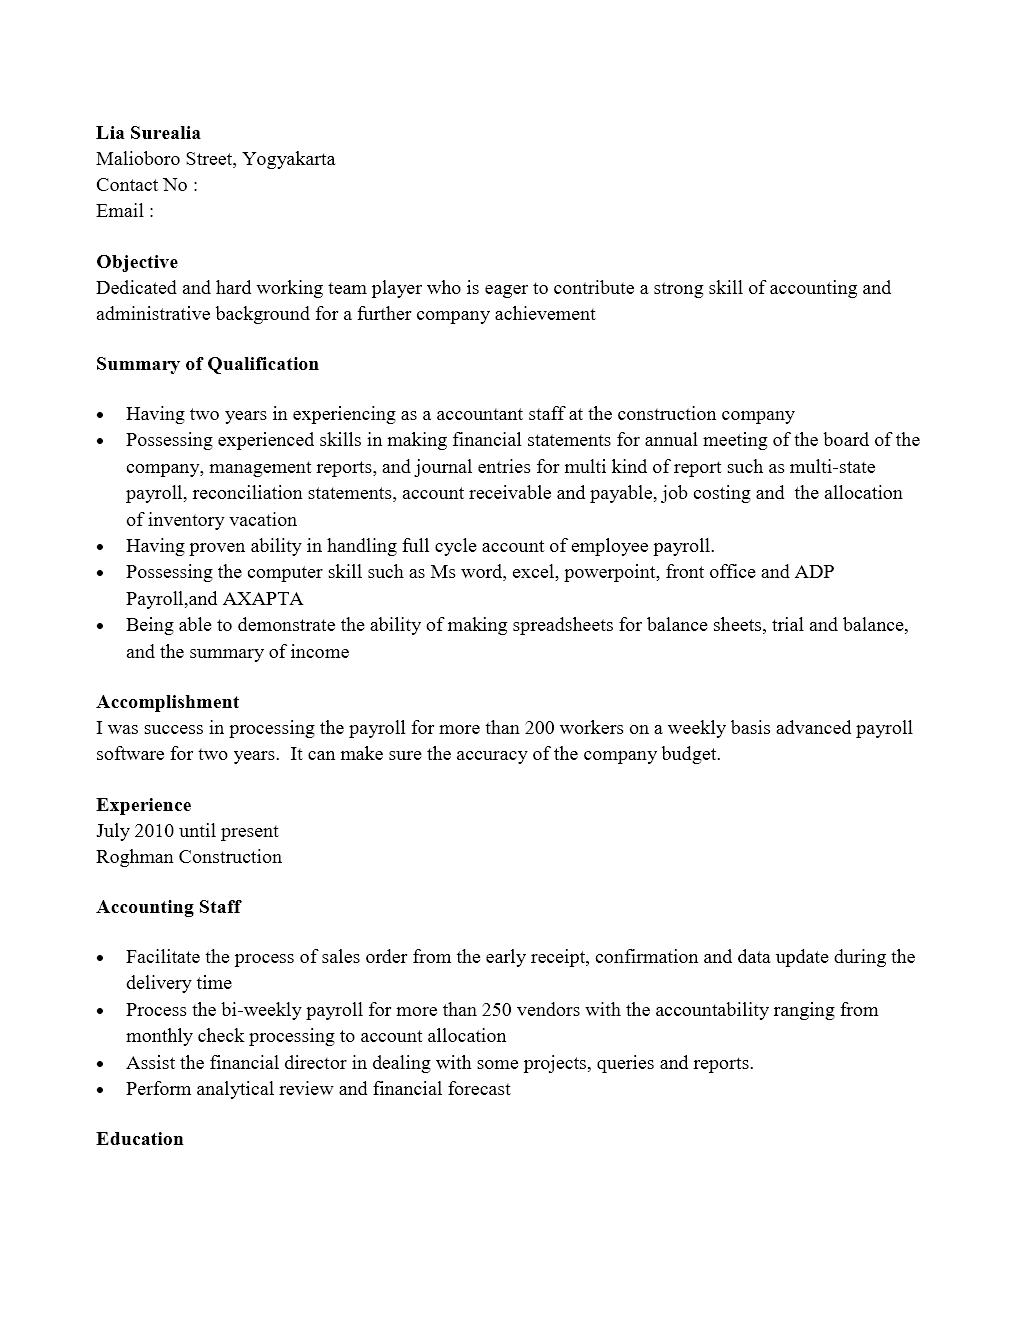 Curriculum Vitae Staf Accounting Yang Menarik Kumpulan Contoh Surat